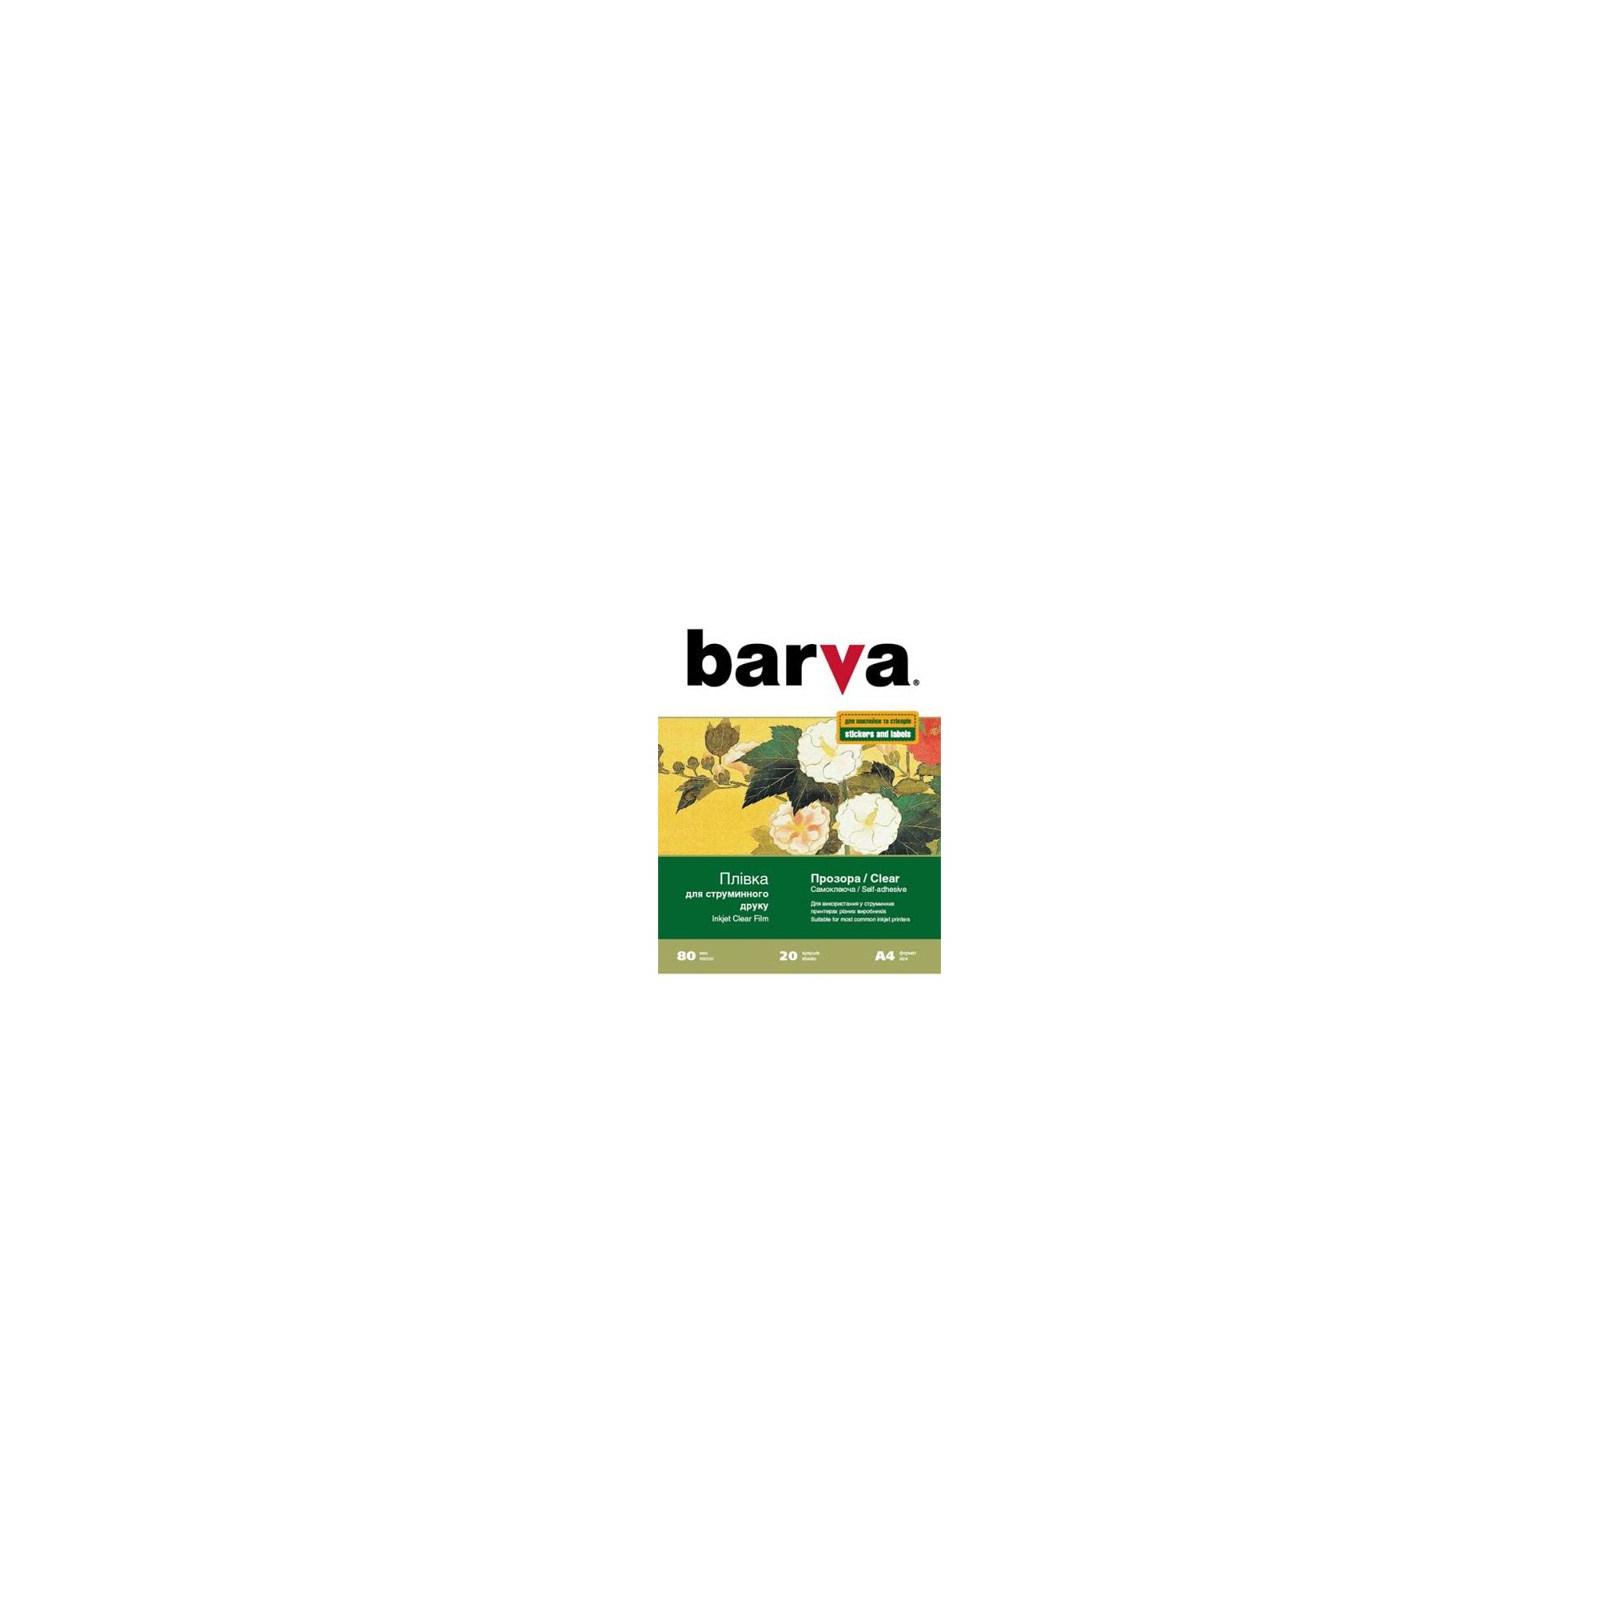 Пленка для печати BARVA A4 (IF-ML100-071) (FILM-BAR-ML100-071)